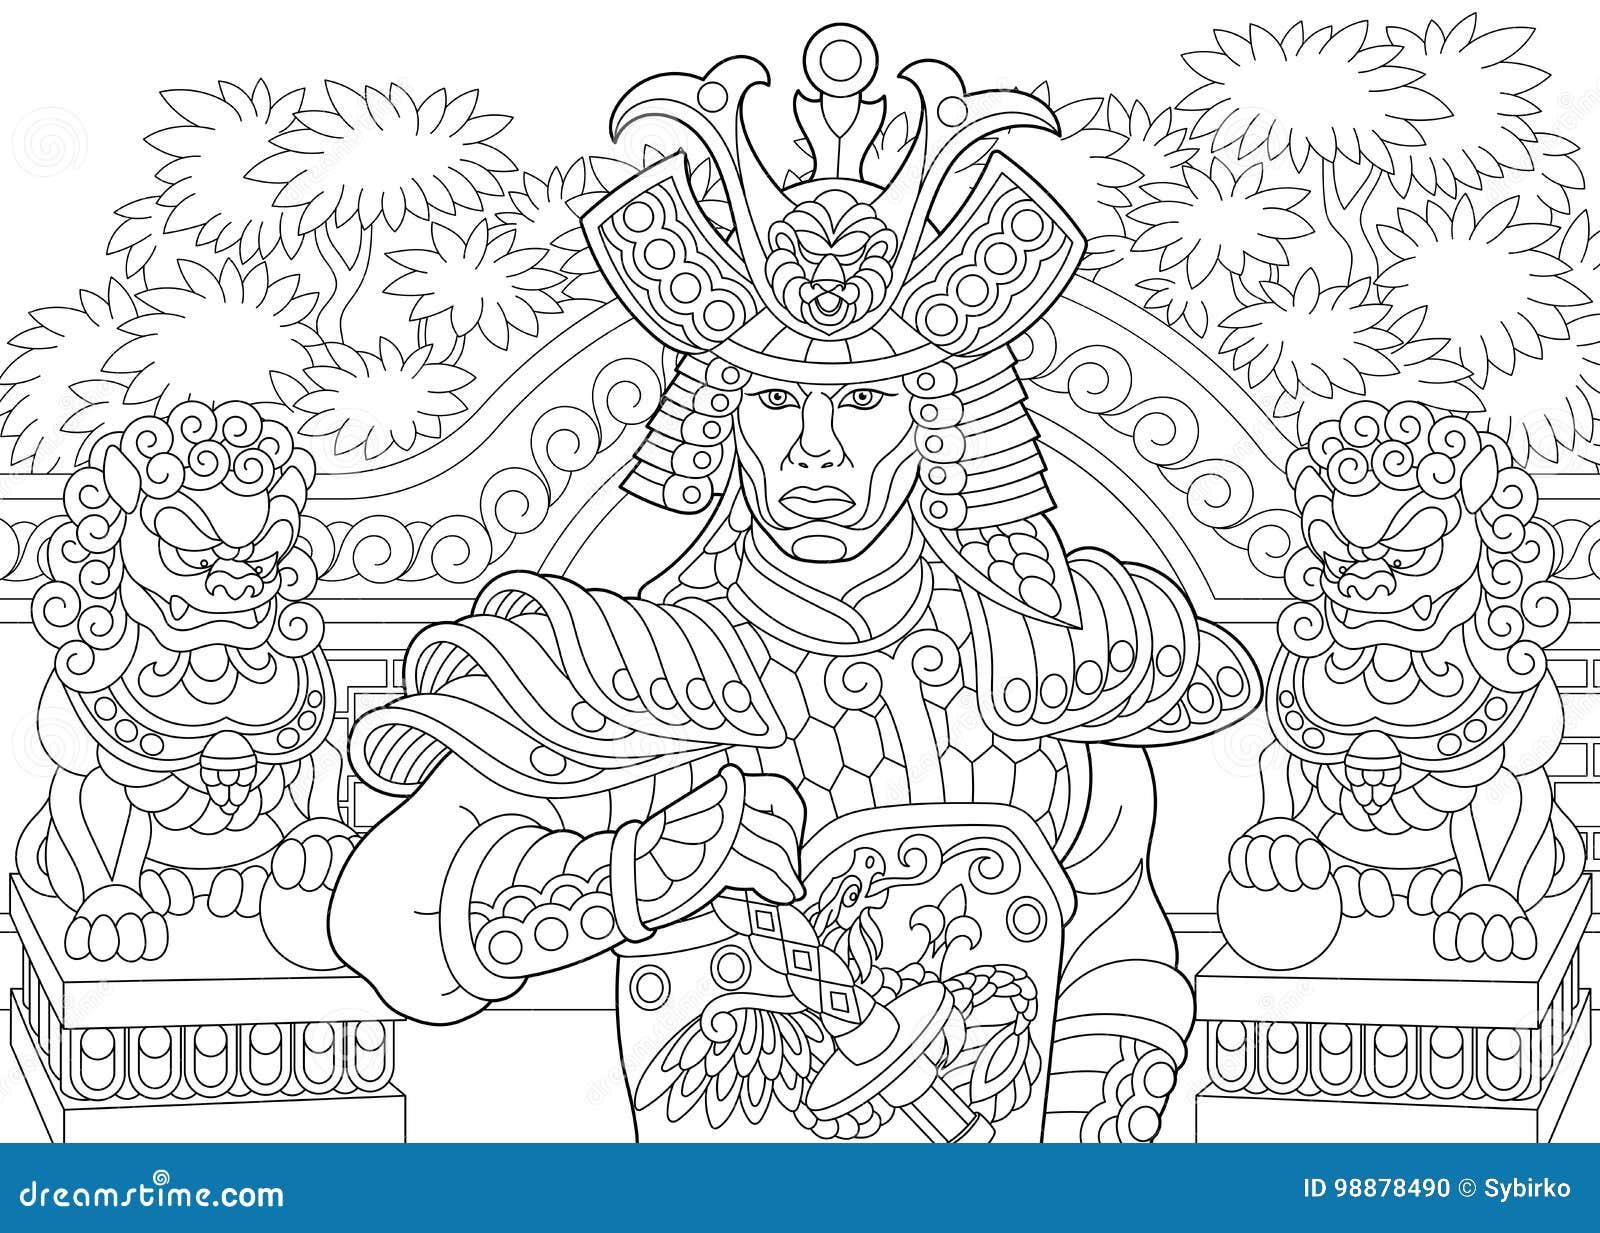 Zentangle Stilisierte Japanische Samurais Vektor Abbildung ...